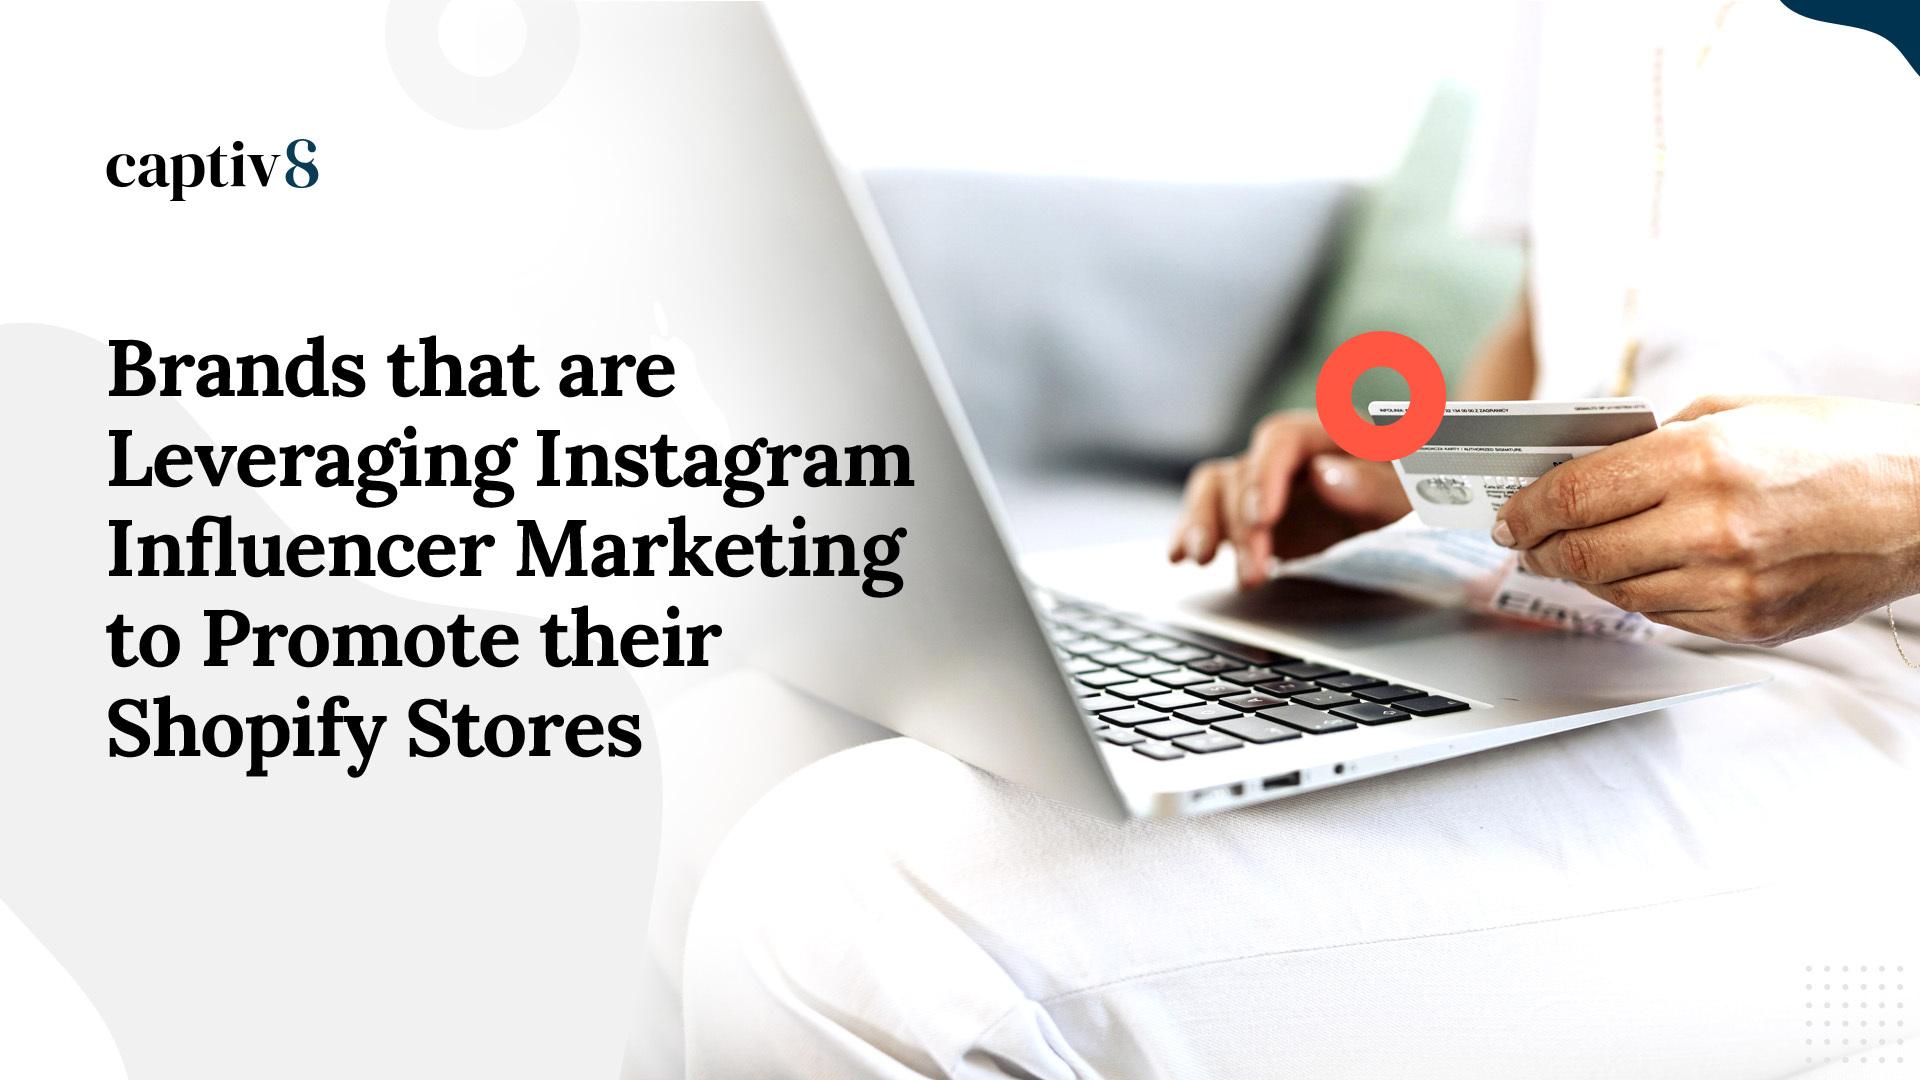 Instagram Influencer Marketing Shopify Stores